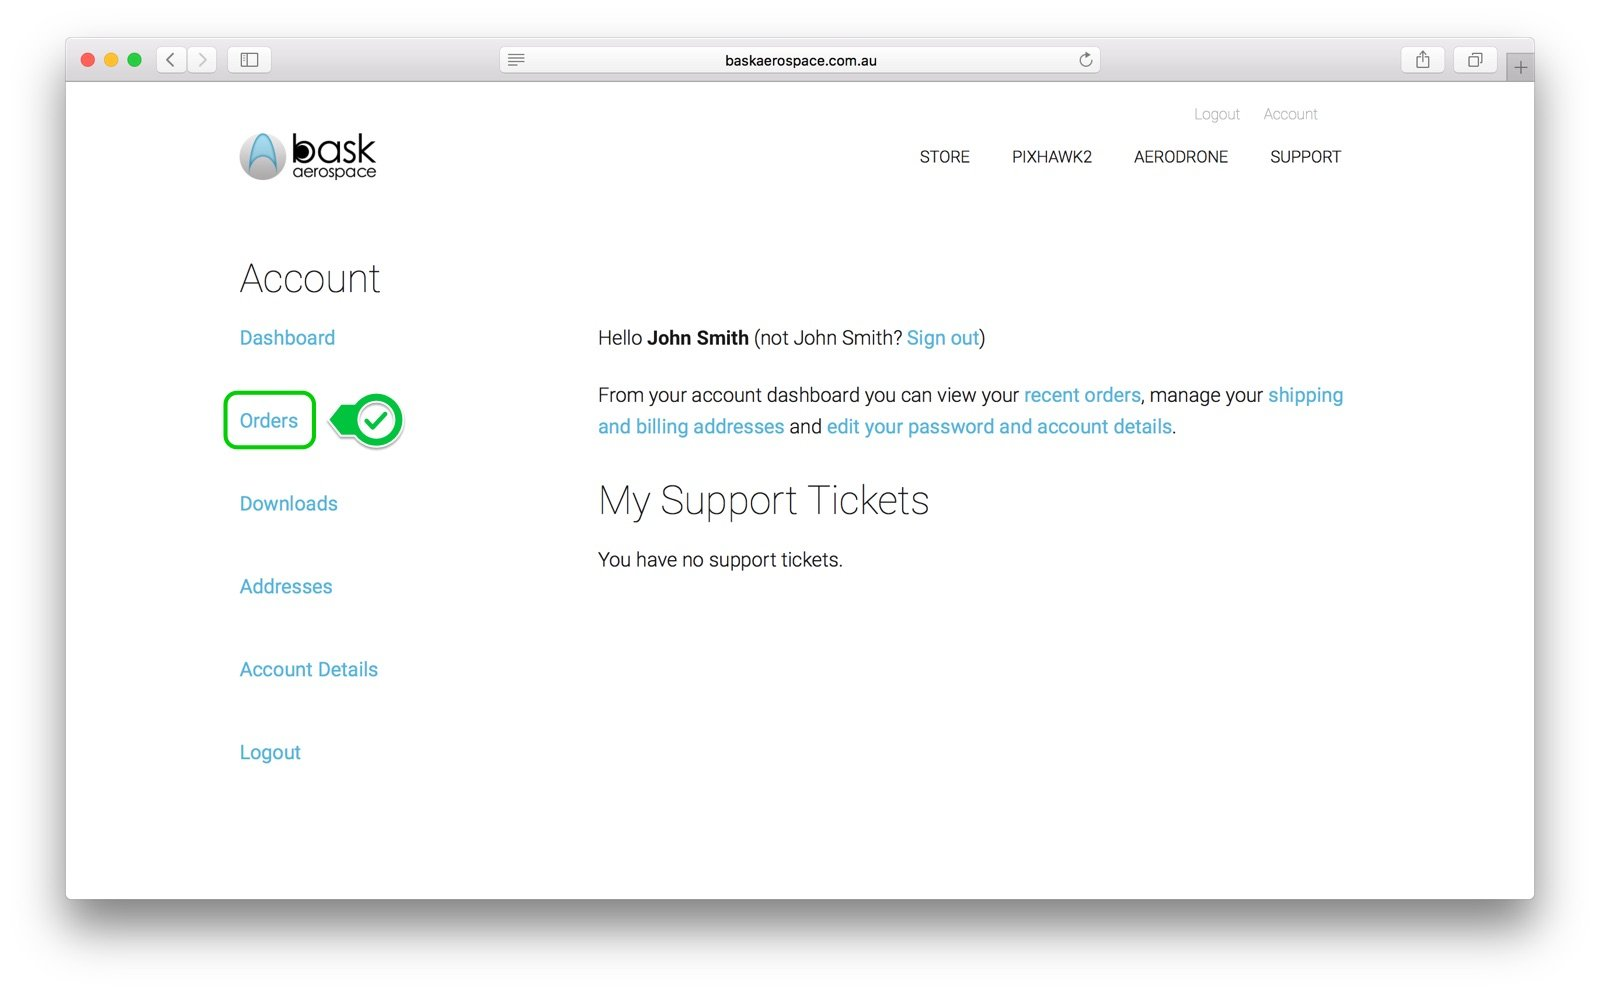 myaccount-page-screenshot